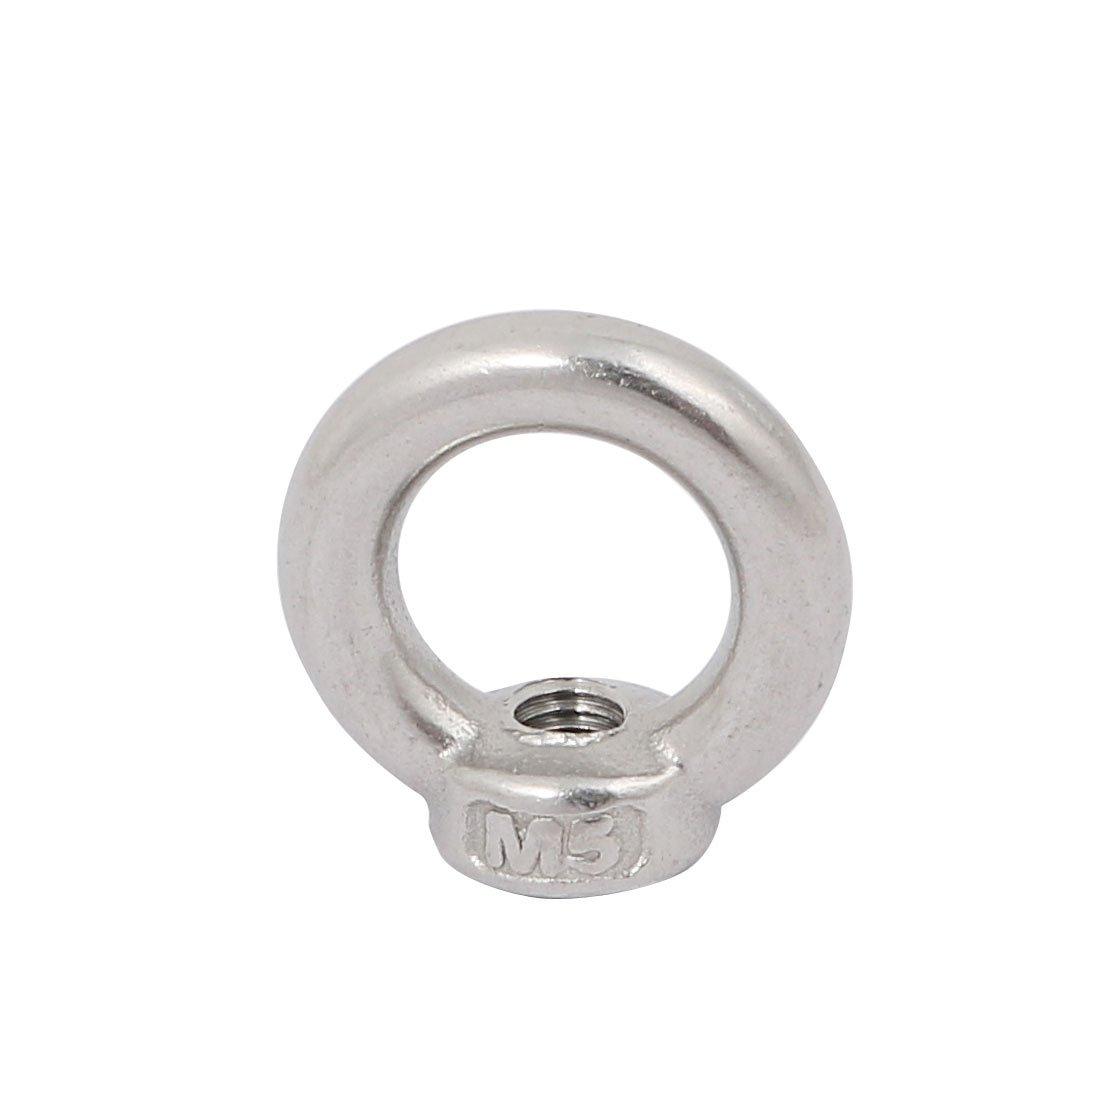 sourcing map M5 filettatura femmina 304 acciaio inox forma anello Occhio sollevamento dado 5pz.